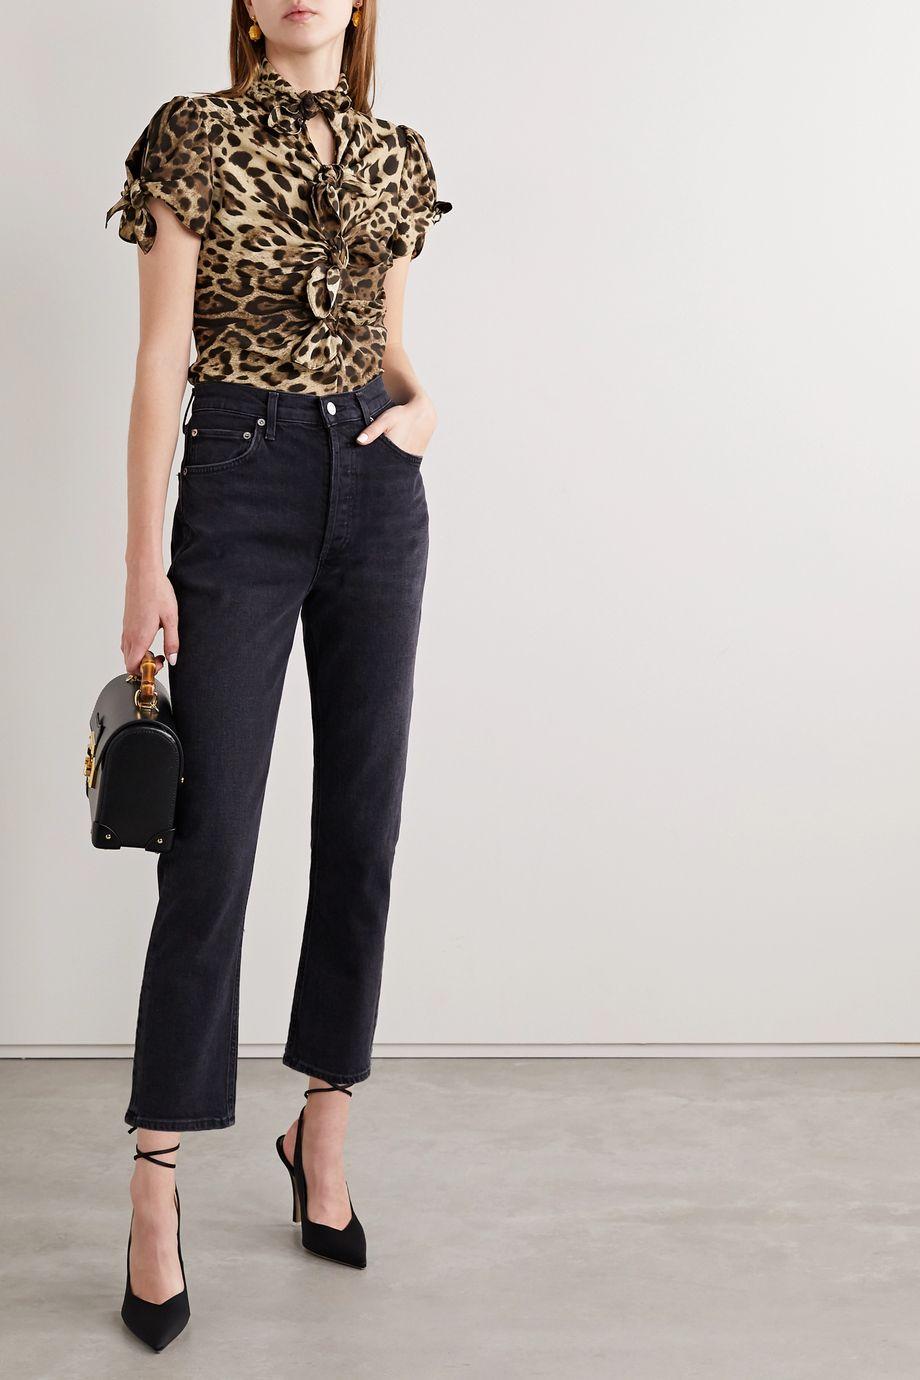 Dolce & Gabbana Knotted cutout leopard-print stretch-silk crepe de chine blouse